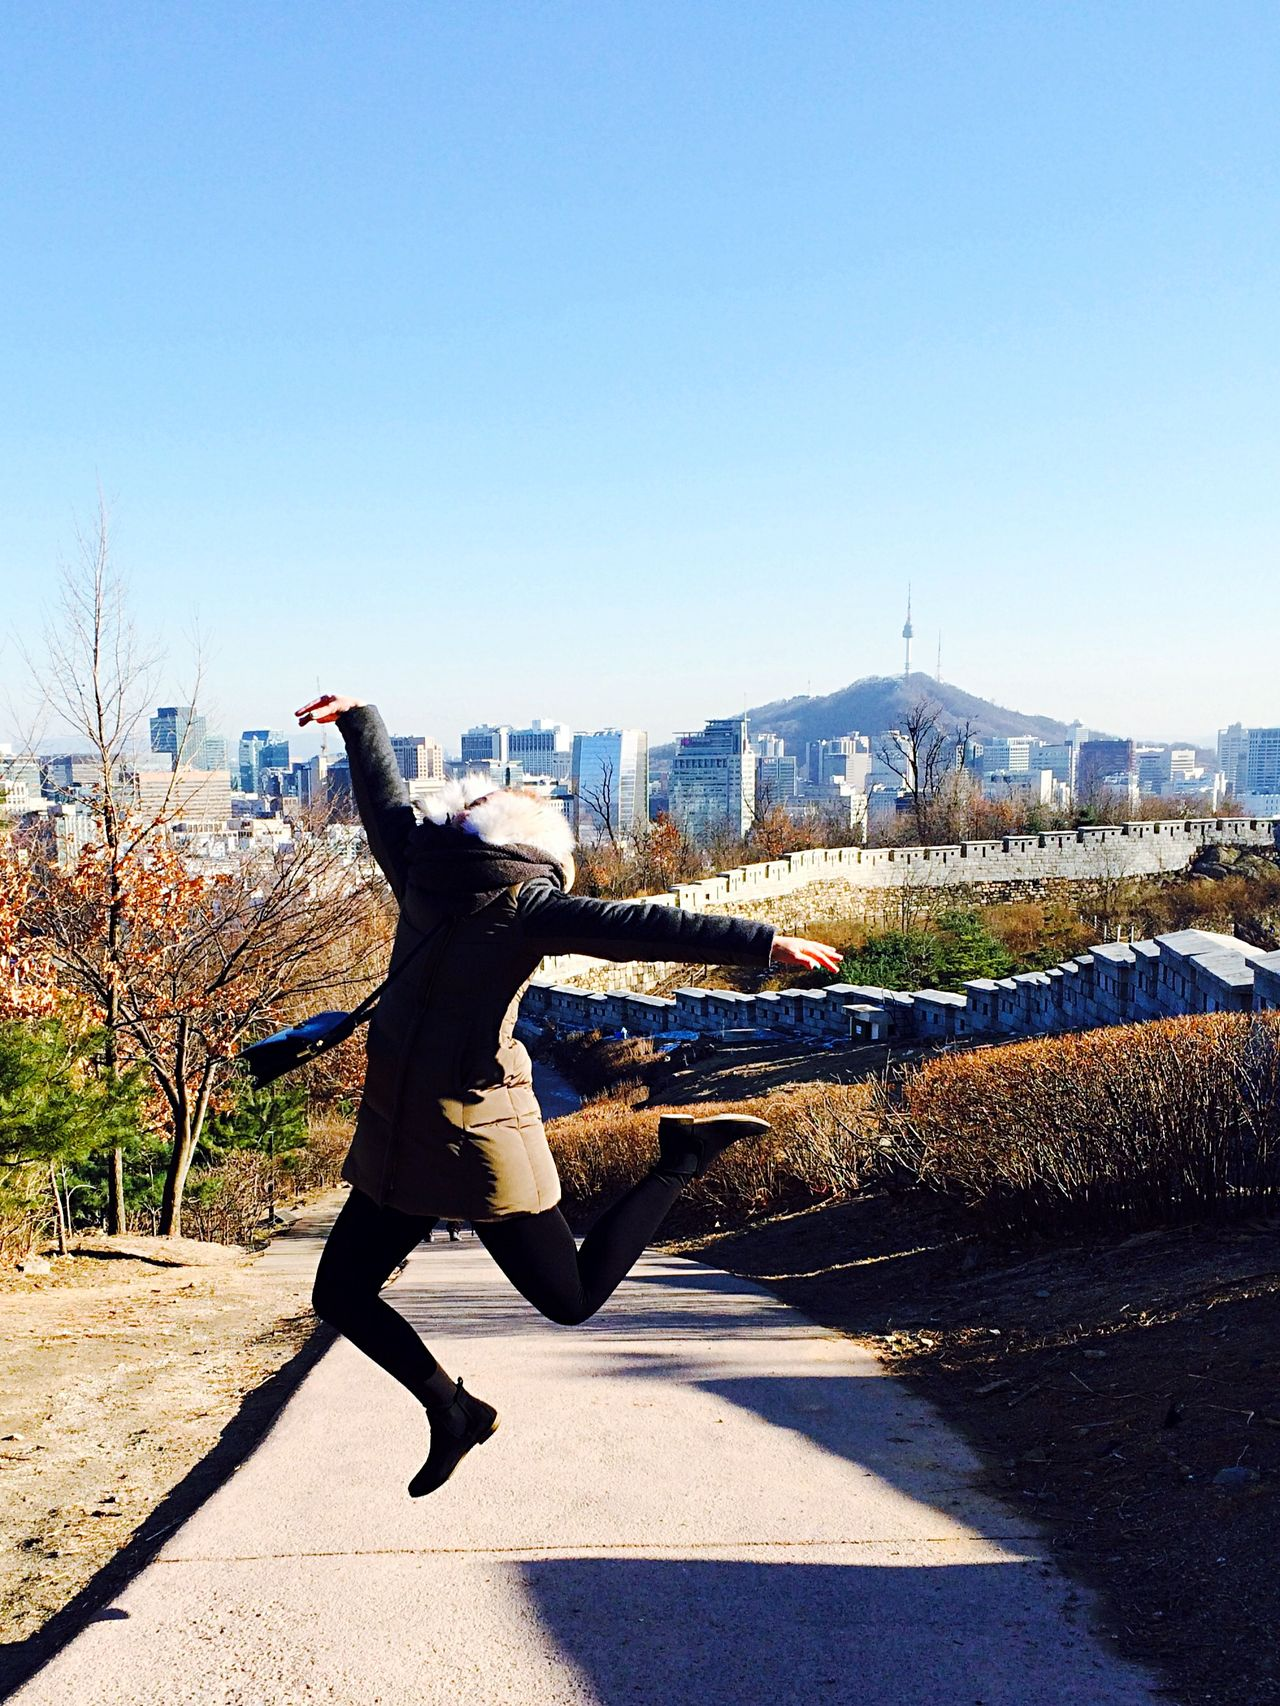 Seoul Fortress Inwangsan Hiking Hiking Trail On A Hike Perfect Weather Jumping Lotti On Tour Kids Having Fun and Lotti no Head :)